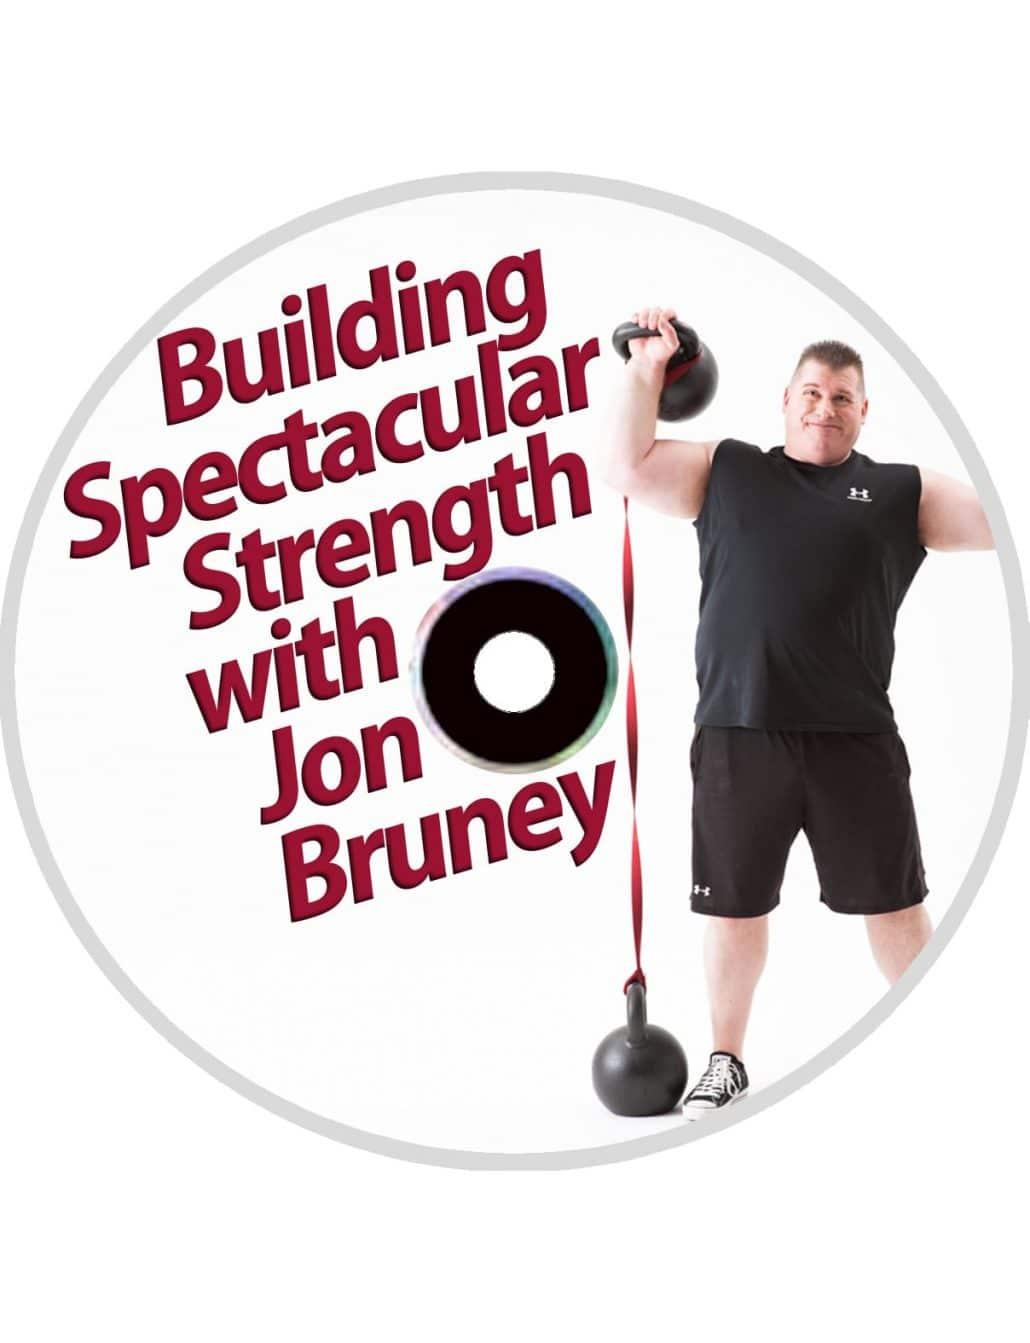 148-Jon-Bruney-4-CD